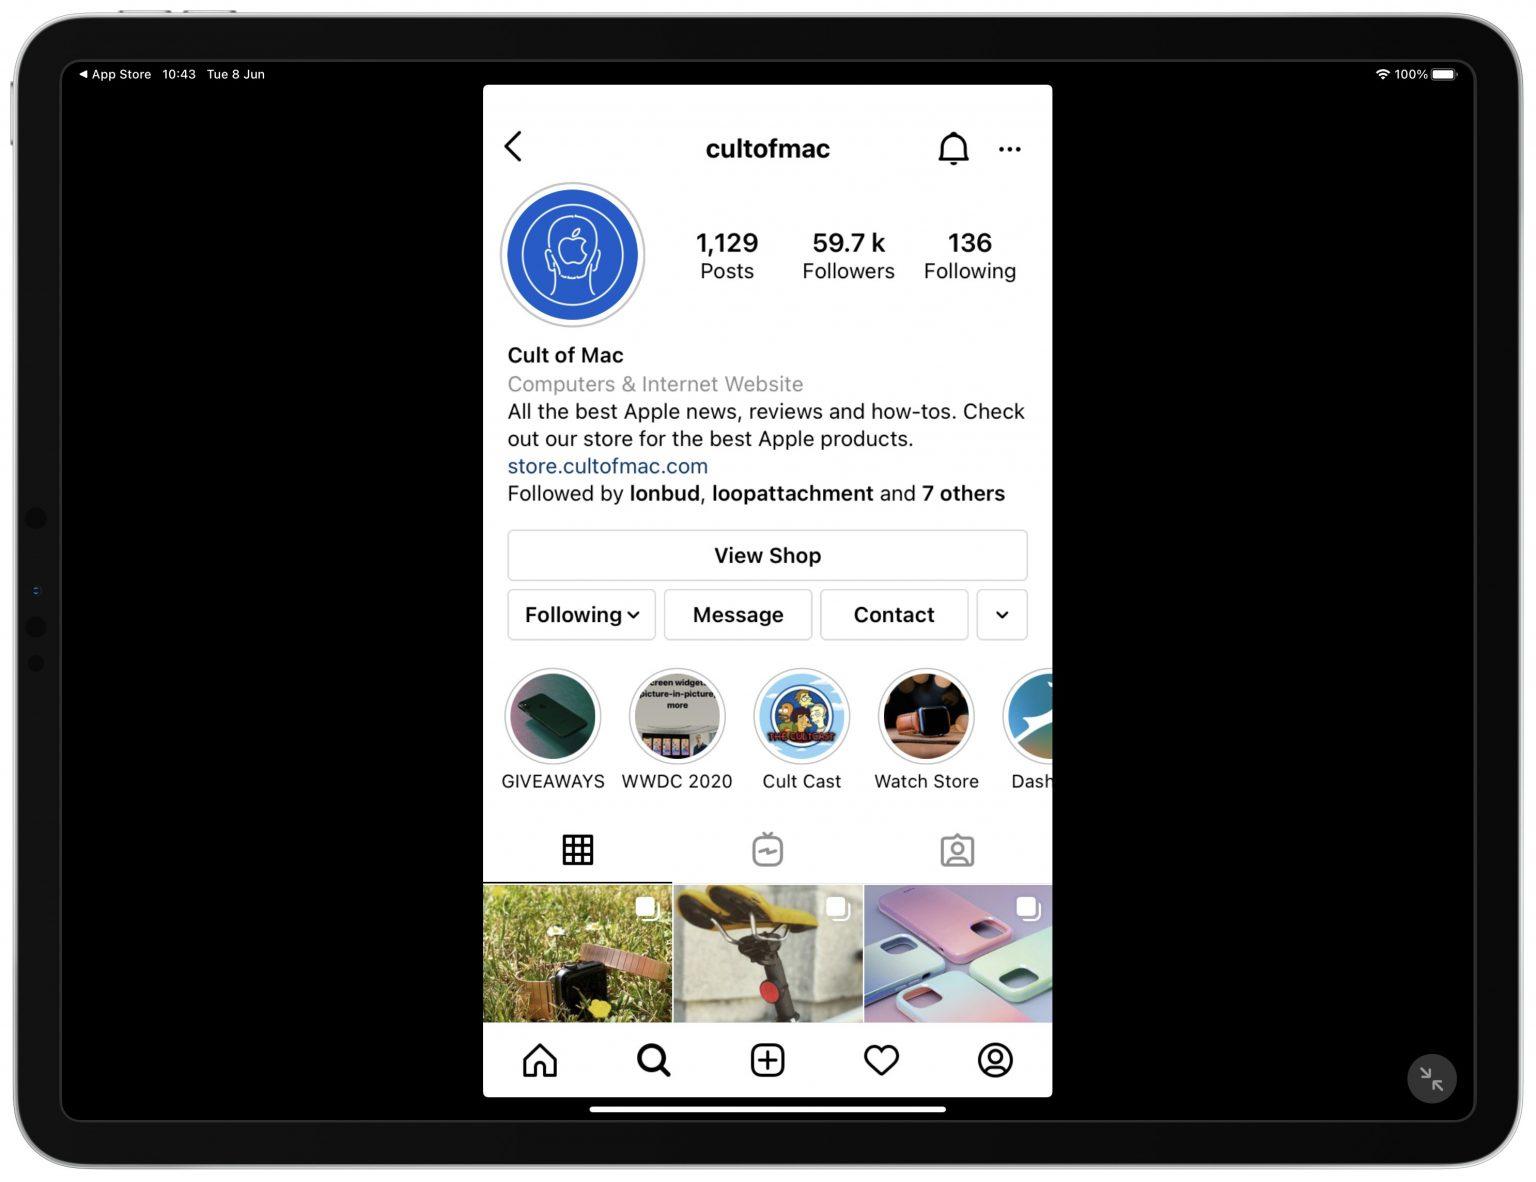 iPhone apps in iPadOS 15